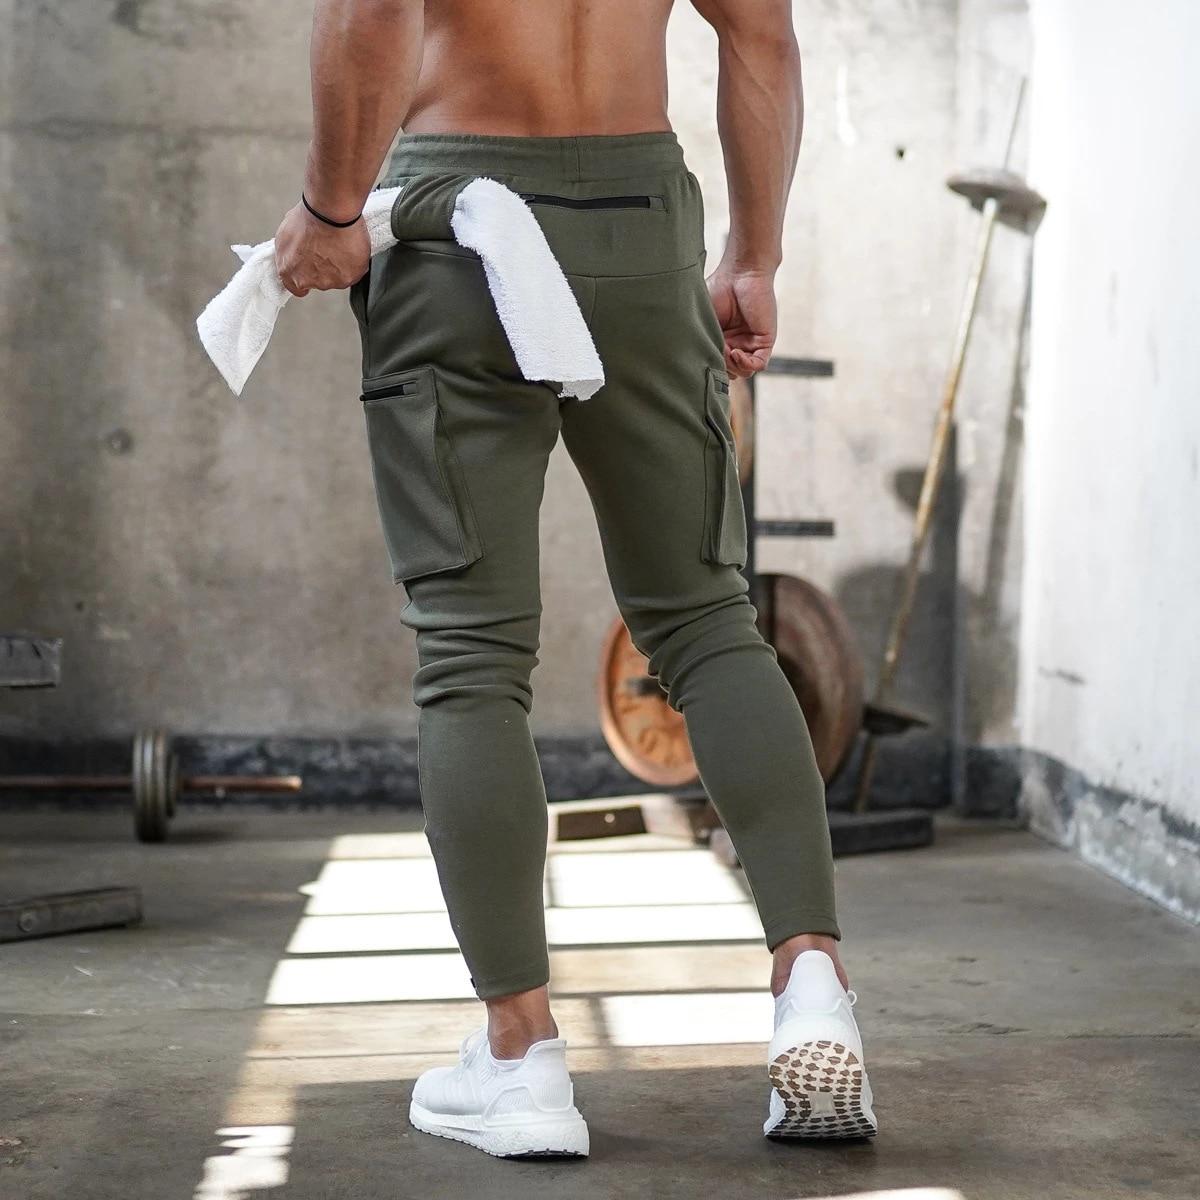 Men Camo Fitness Sport Pants Male Sweatpants Men Joggers Running Workout Training Pants Male Gym Cargo Pants Sportwear Trousers